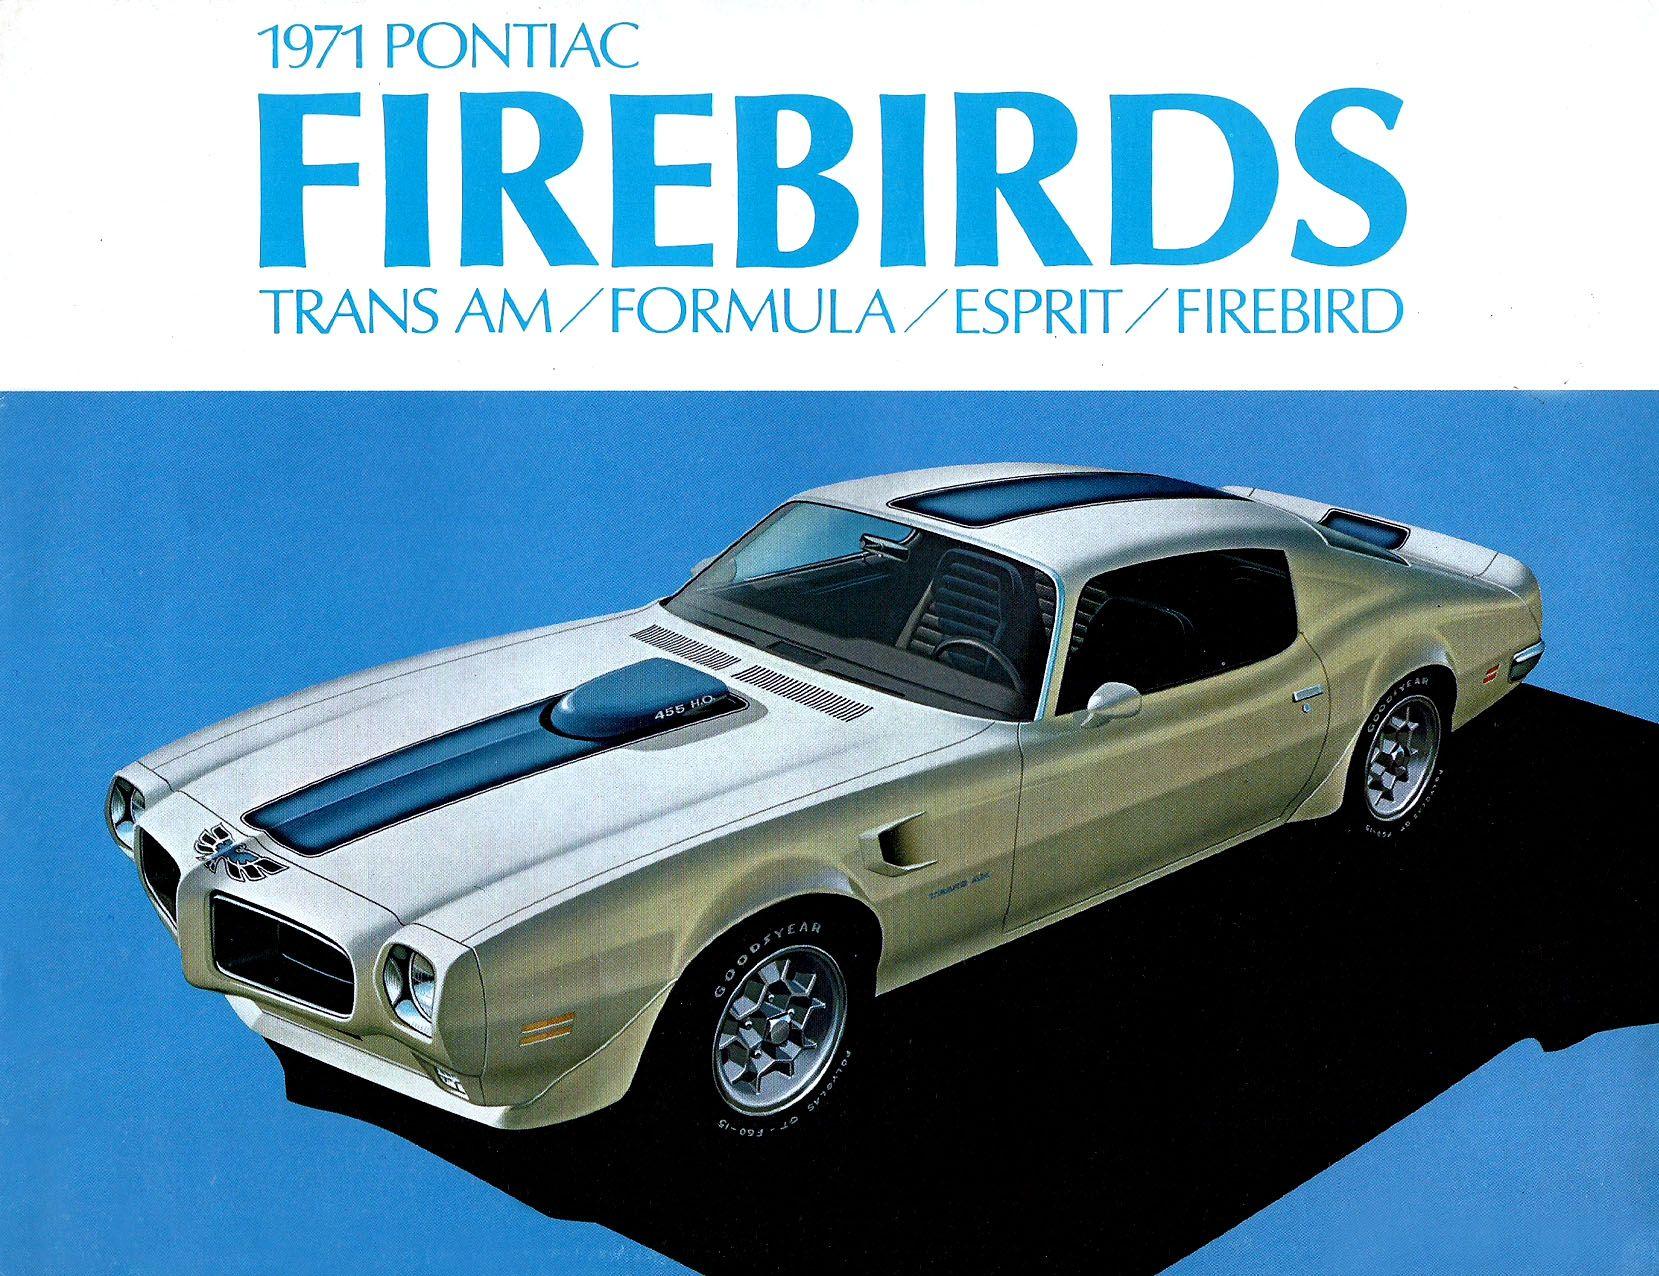 Pontiac firebird vintage parts something